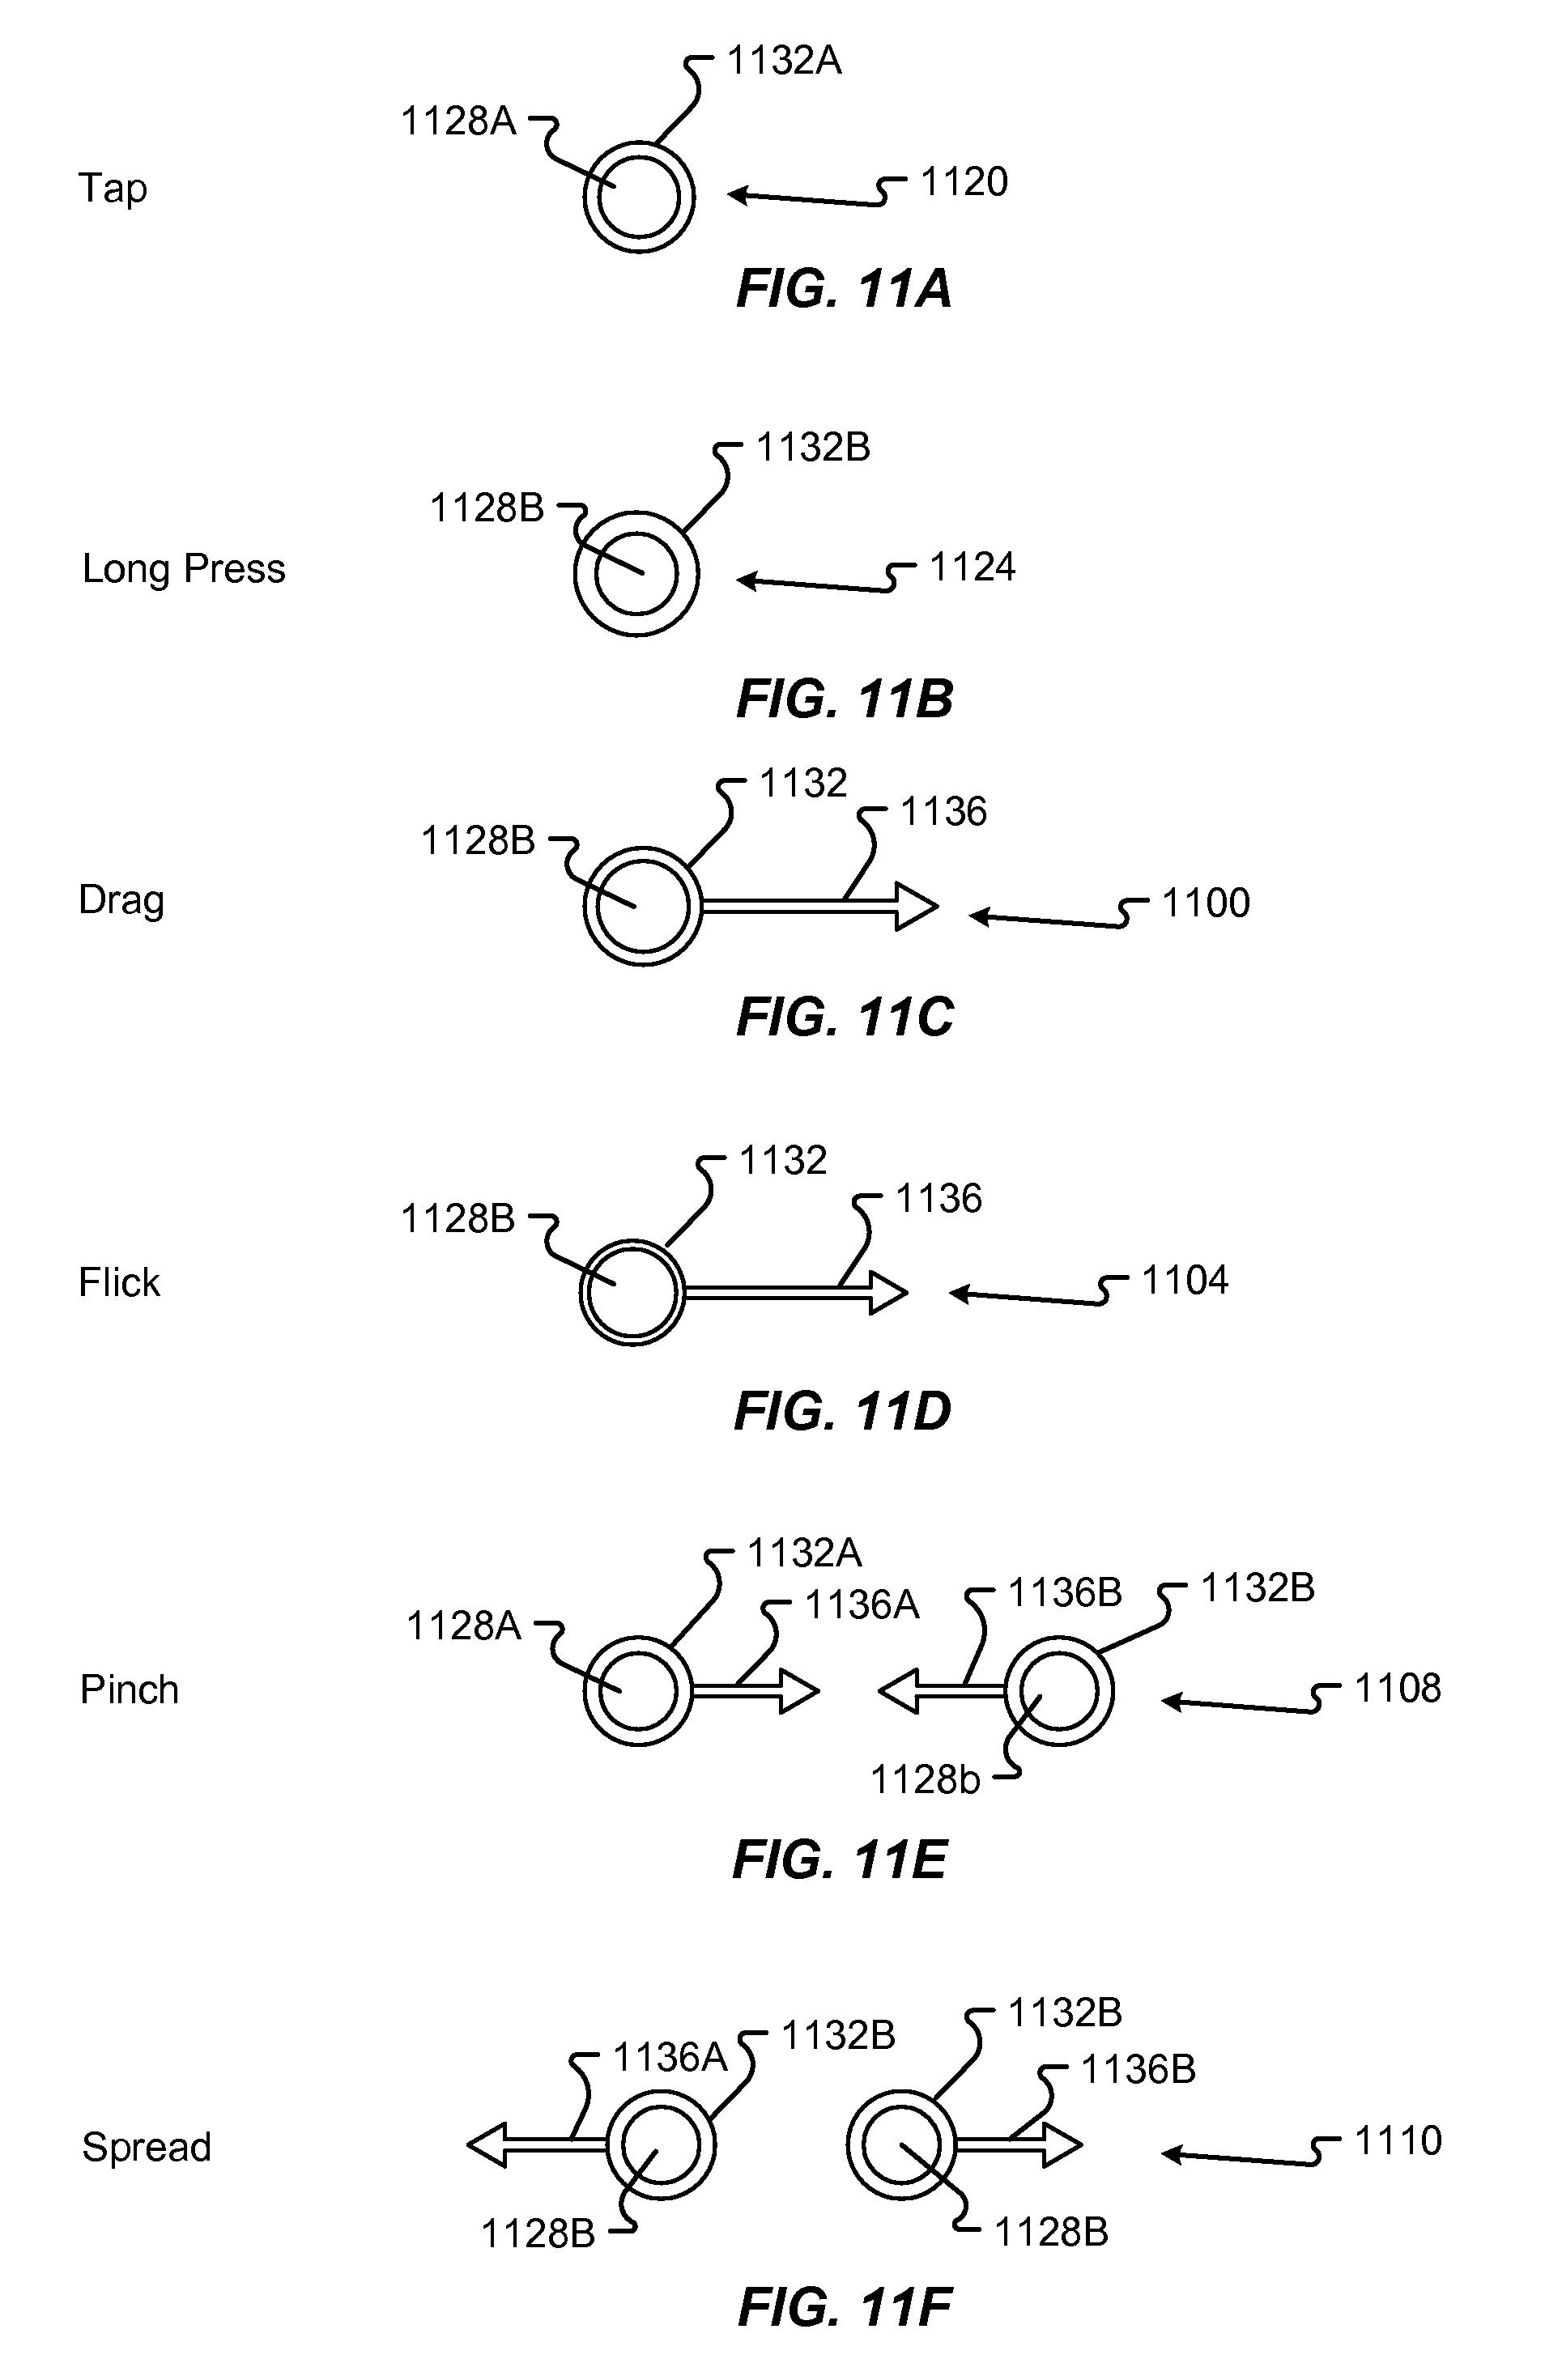 Patent US 9,378,602 B2